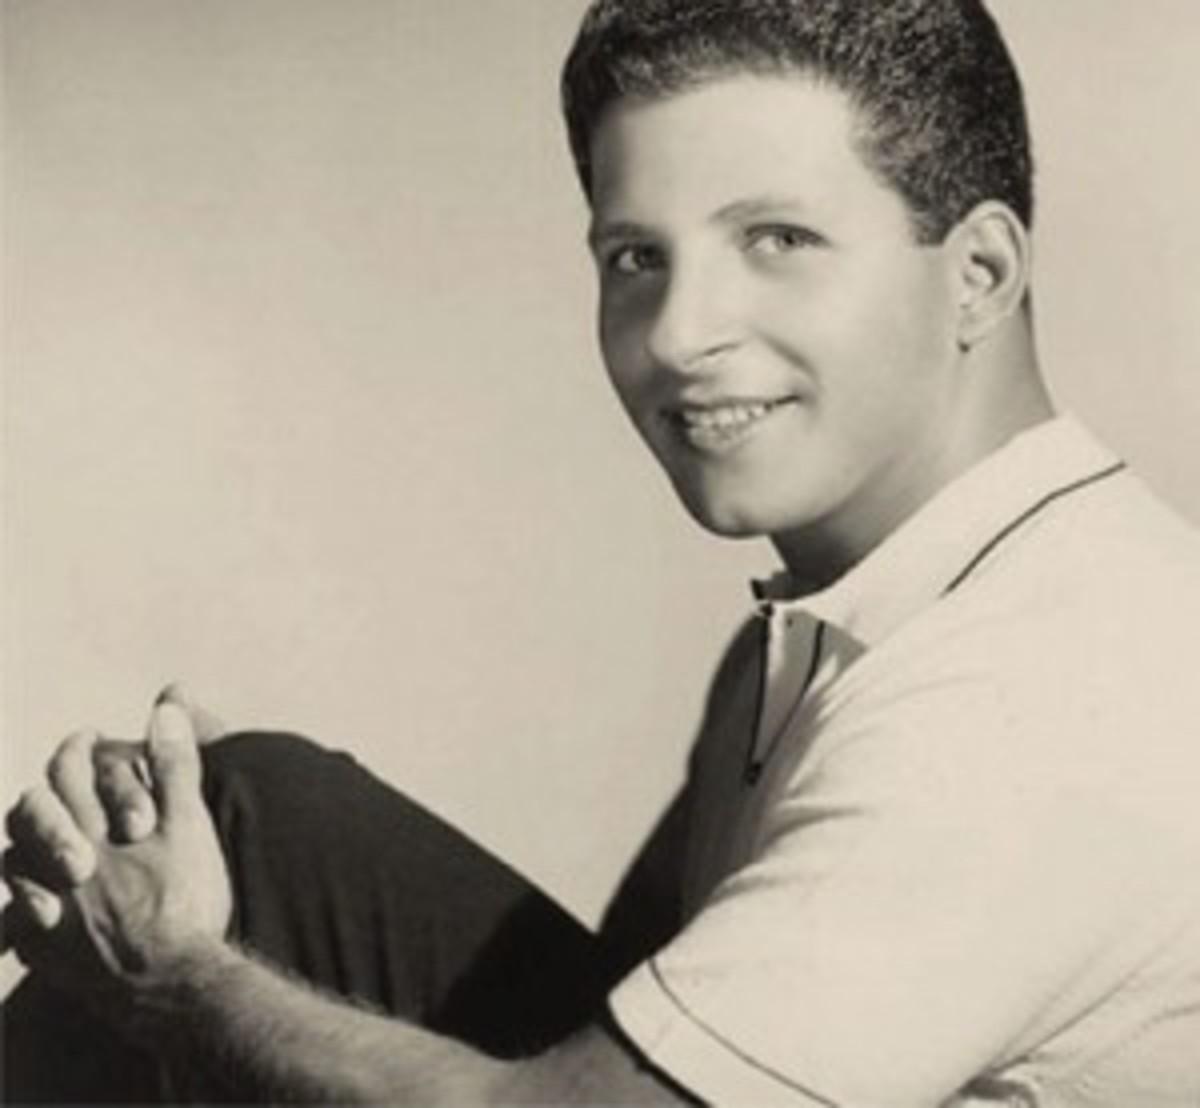 Johnny Maestro's pure tenor voice pleased audiences for decades.